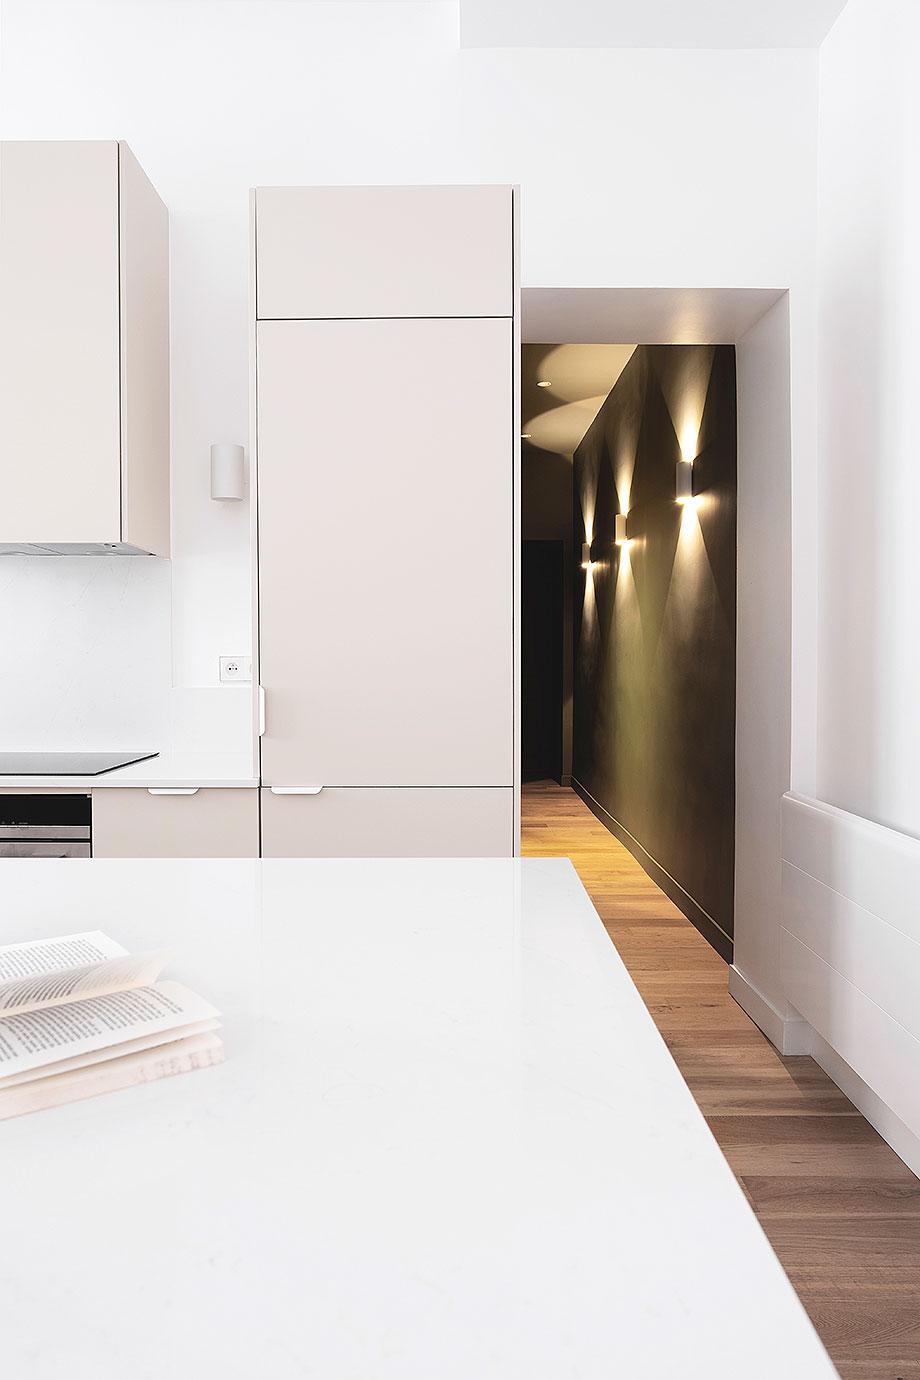 reforma integral de un apartamento en paris por anthropie architecture (s) (7) - foto juliette alexandre